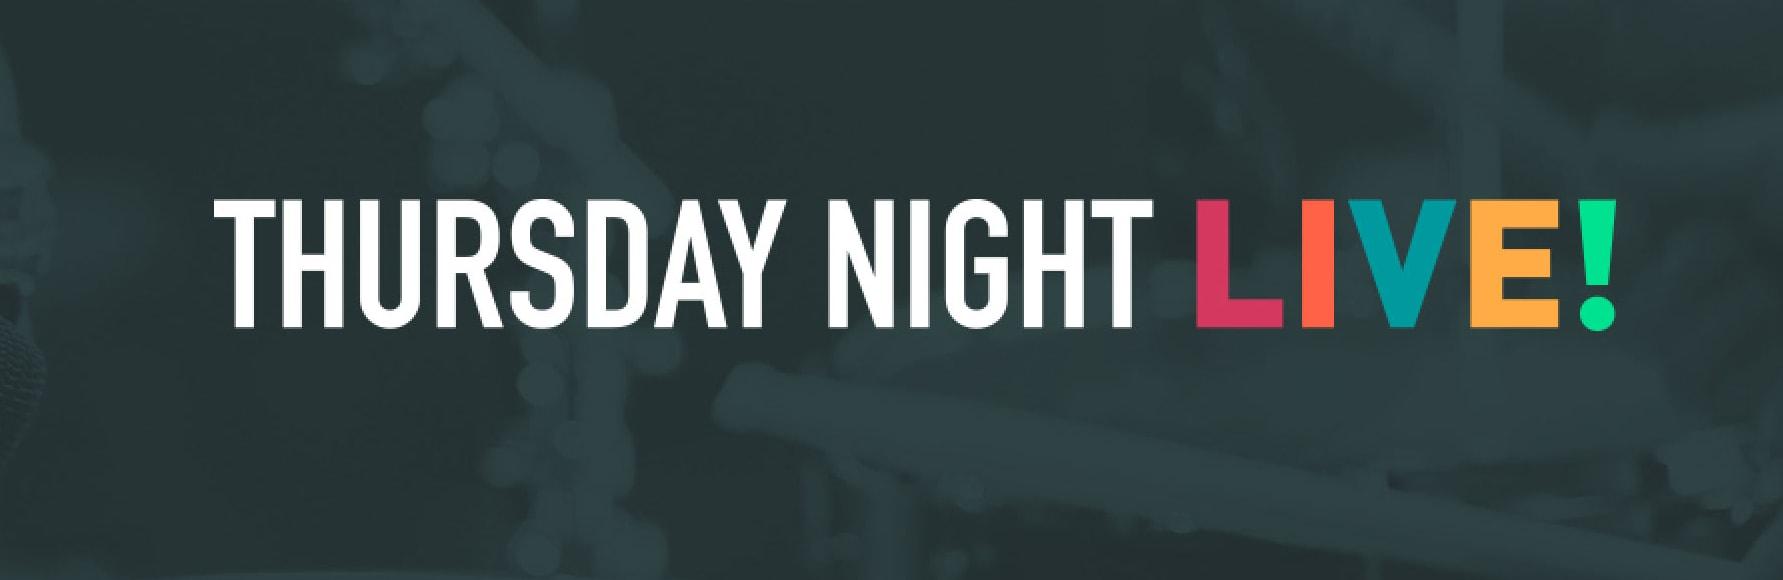 ThursdayNightLive_LogoProof-3-w1783.jpg